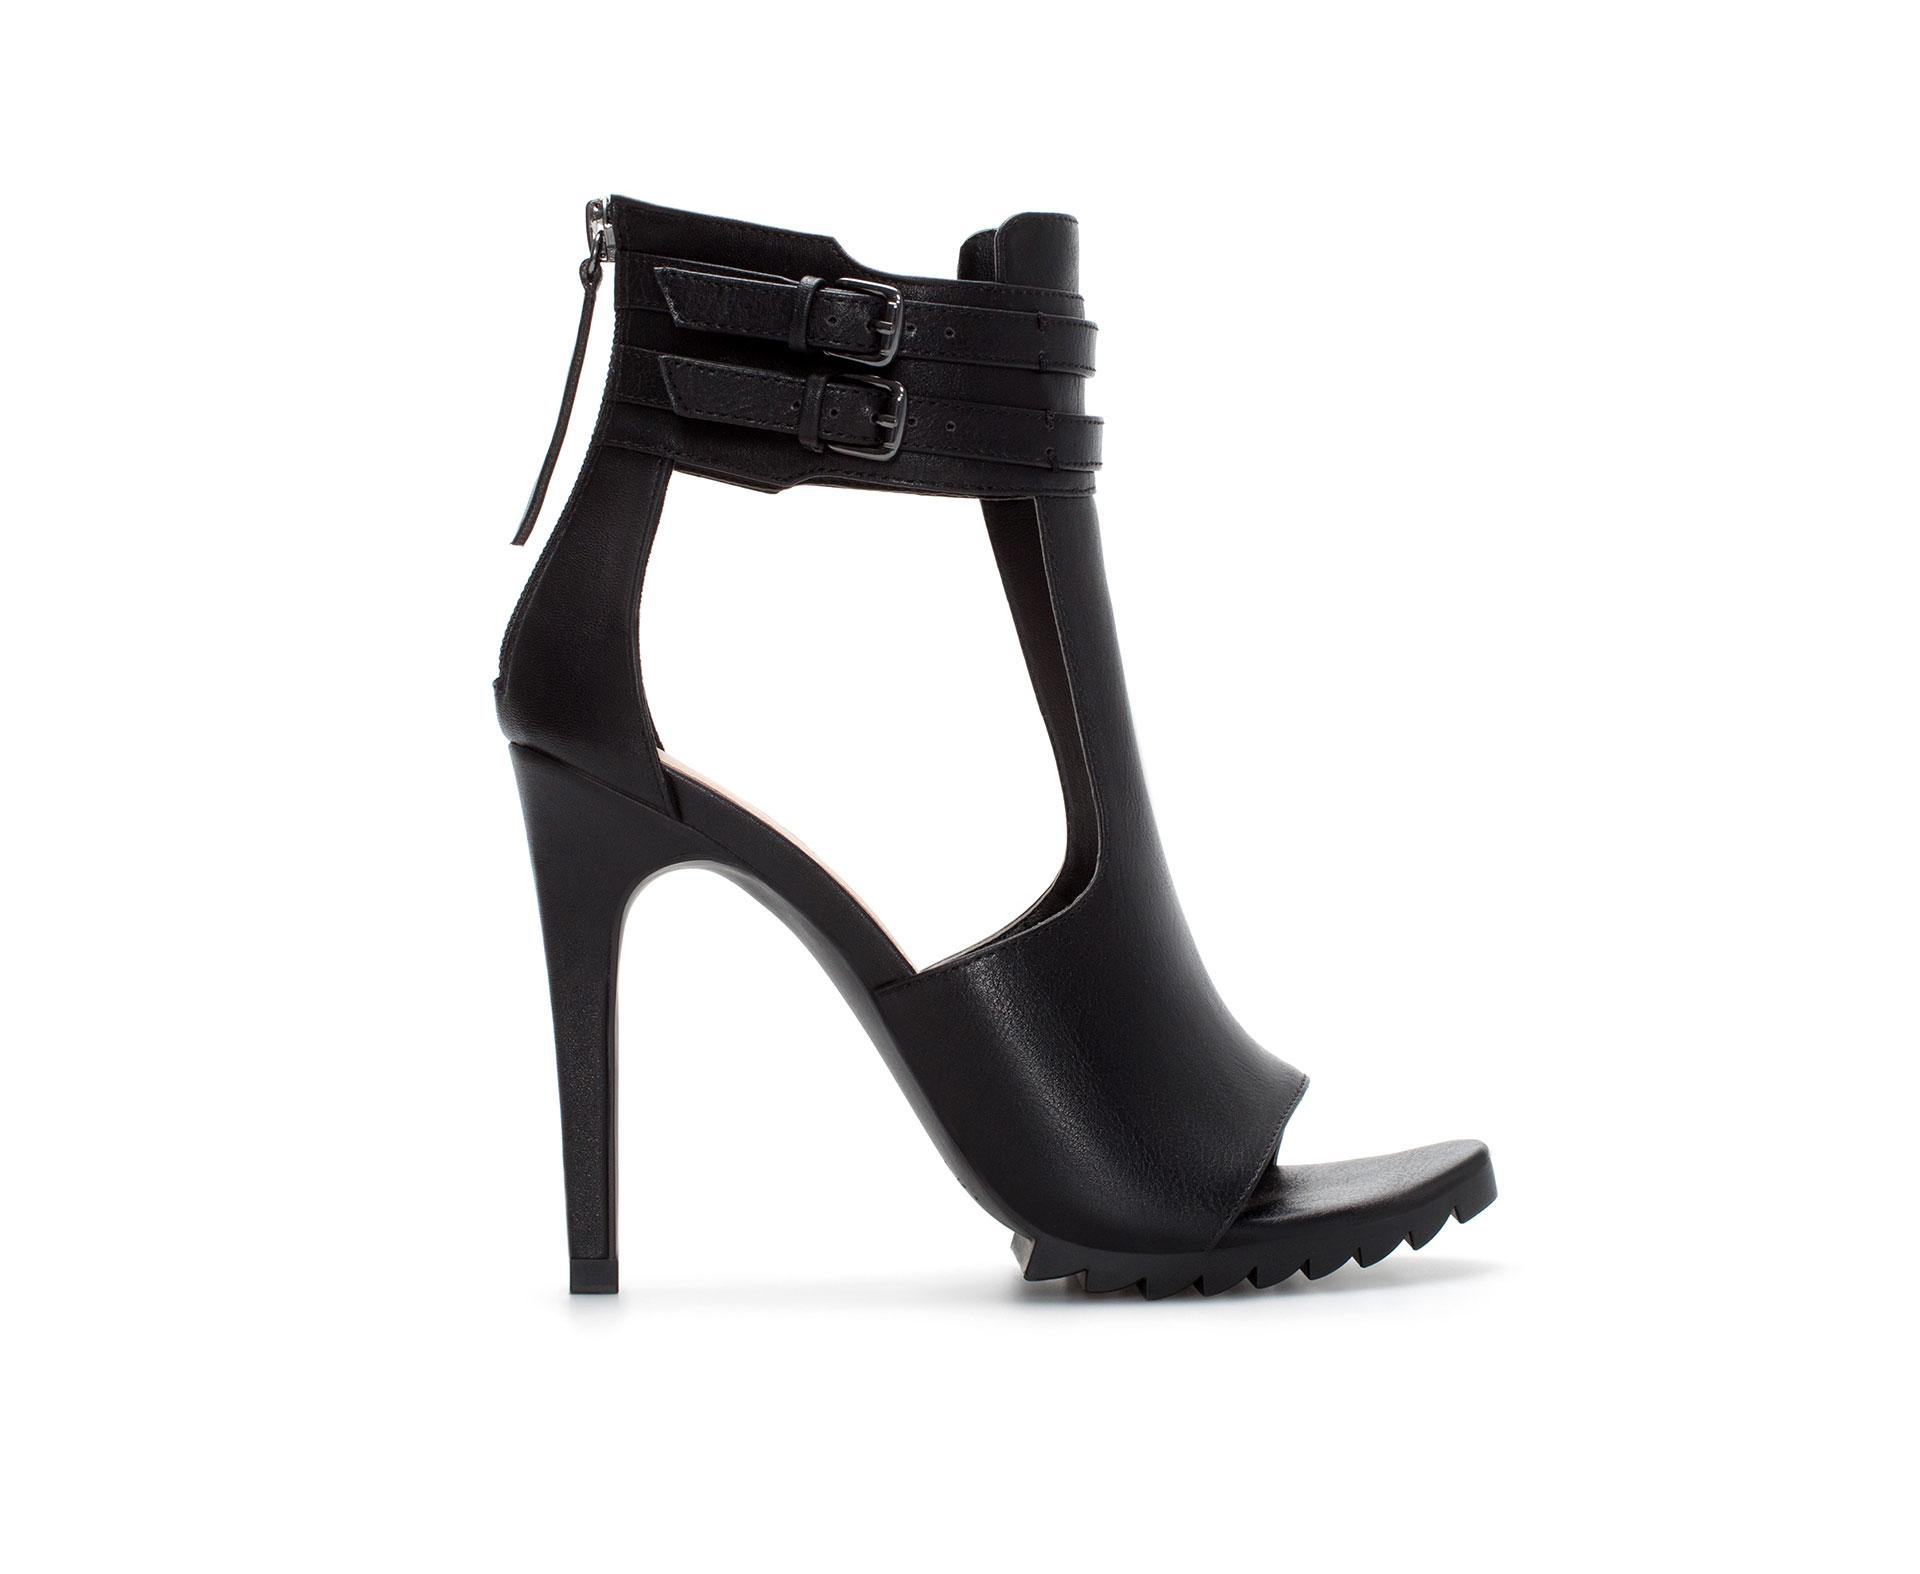 Buckle Ankle Strap Heels